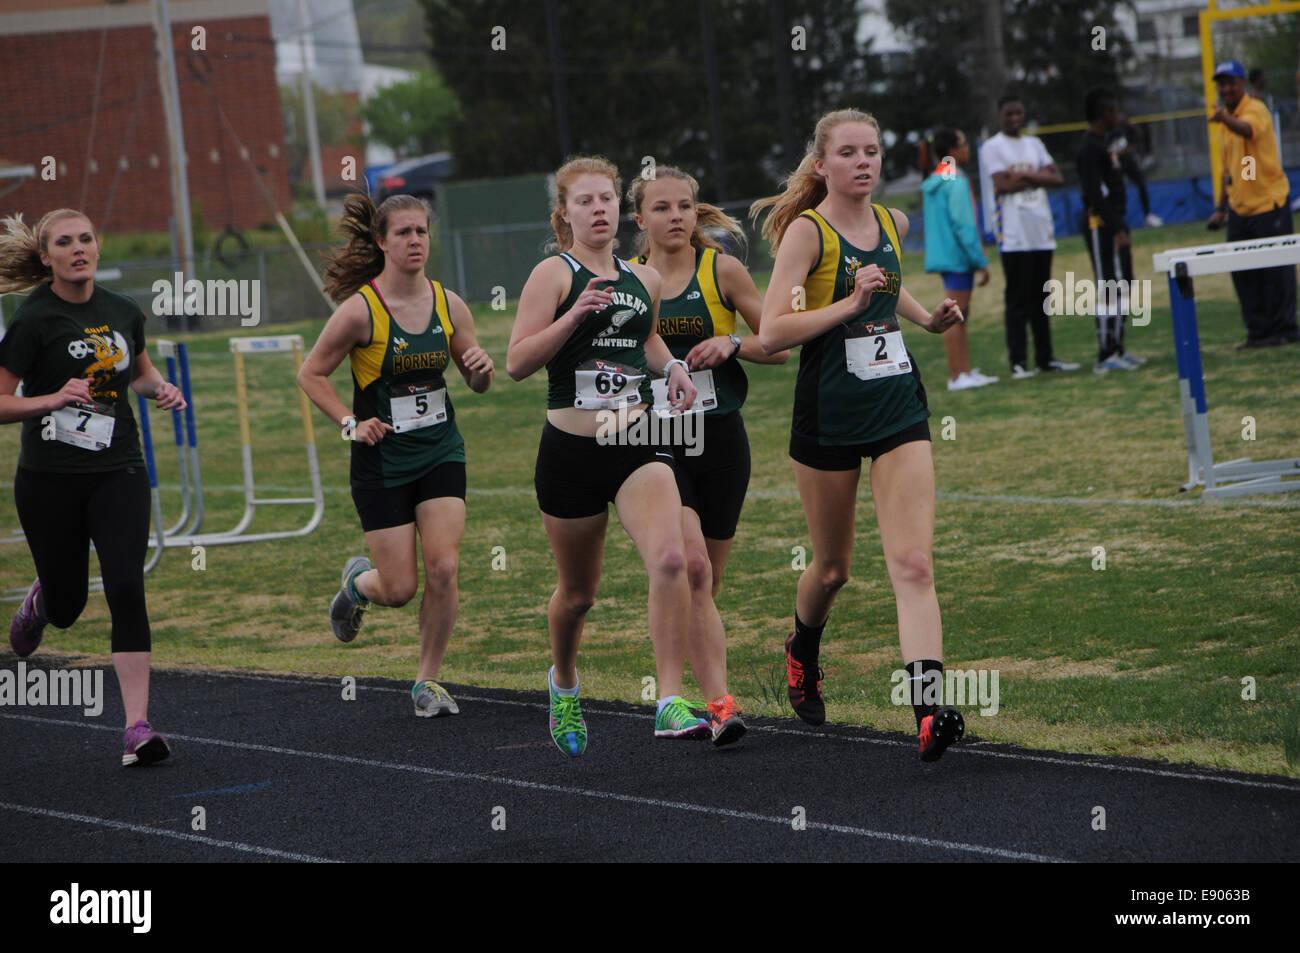 High school track meet - Stock Image